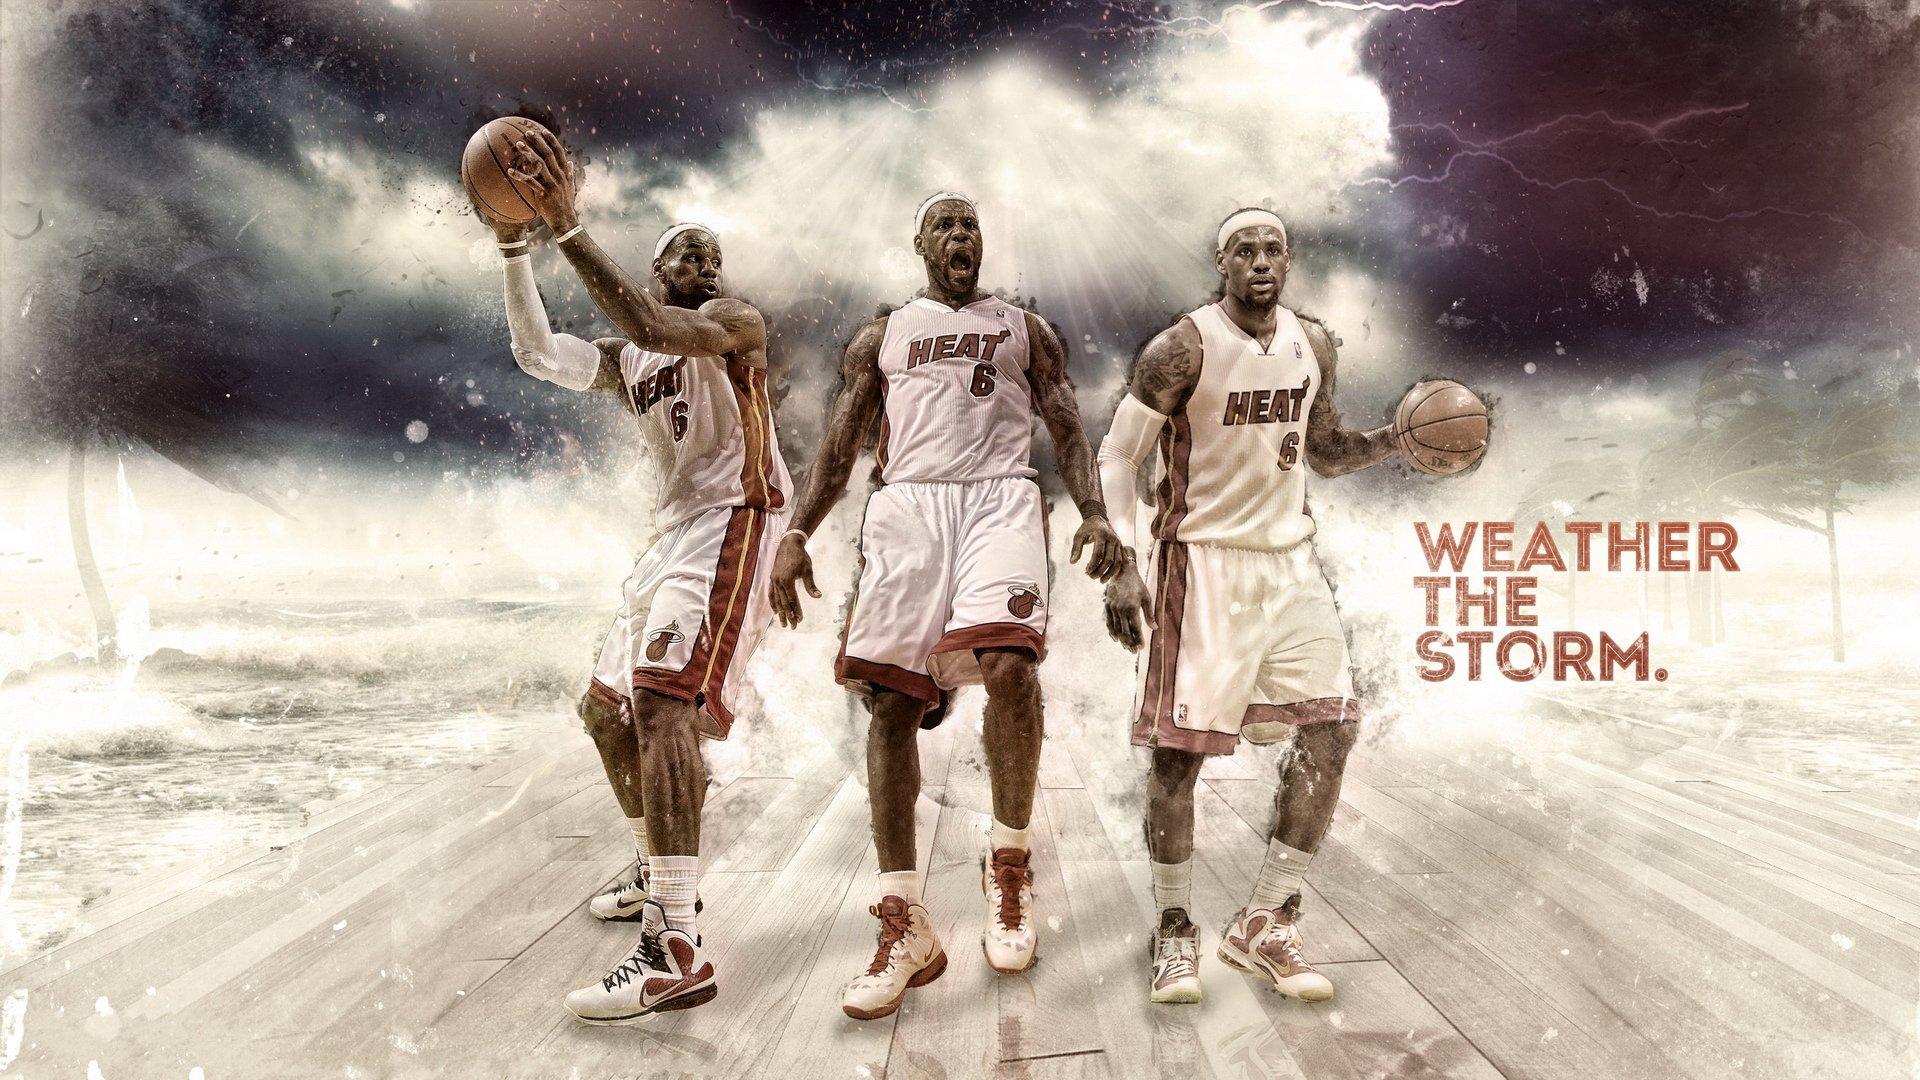 nba体育图片_体育NBA湖人洛杉矶科比